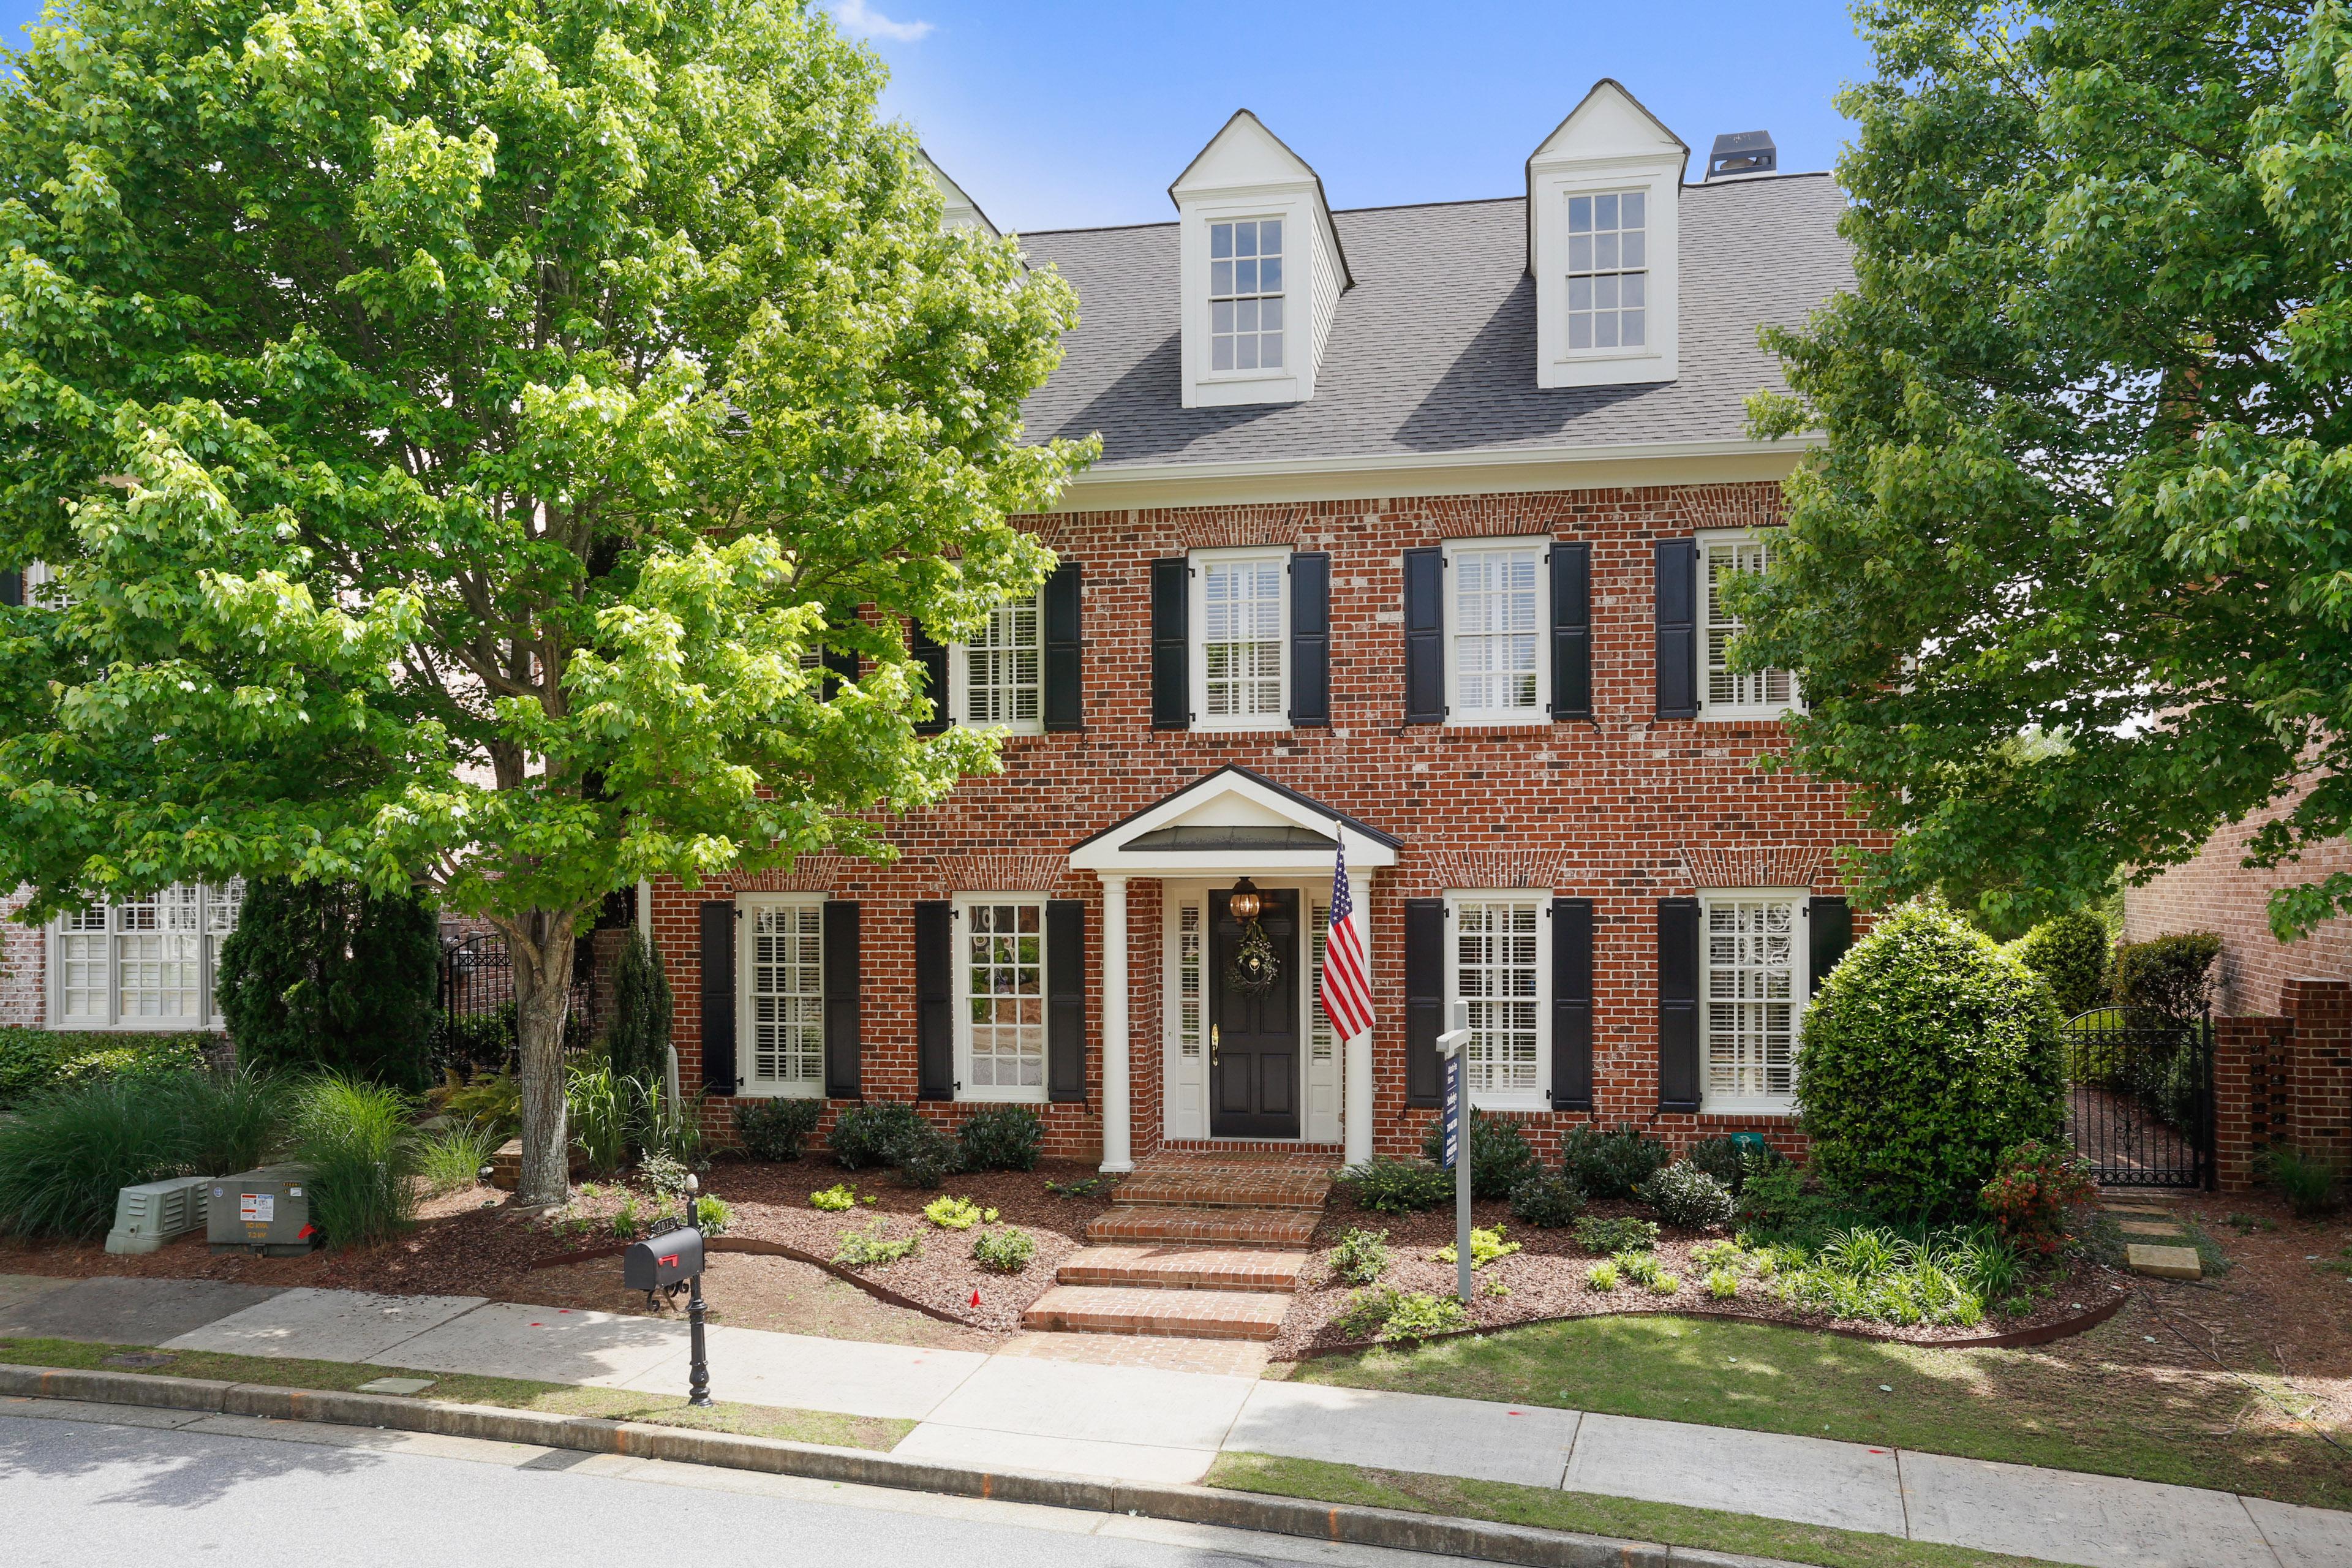 獨棟家庭住宅 為 出售 在 Updated Brick Home in Sought After Palisades 1015 Ambrose Avenue Alpharetta, 喬治亞州, 30022 美國